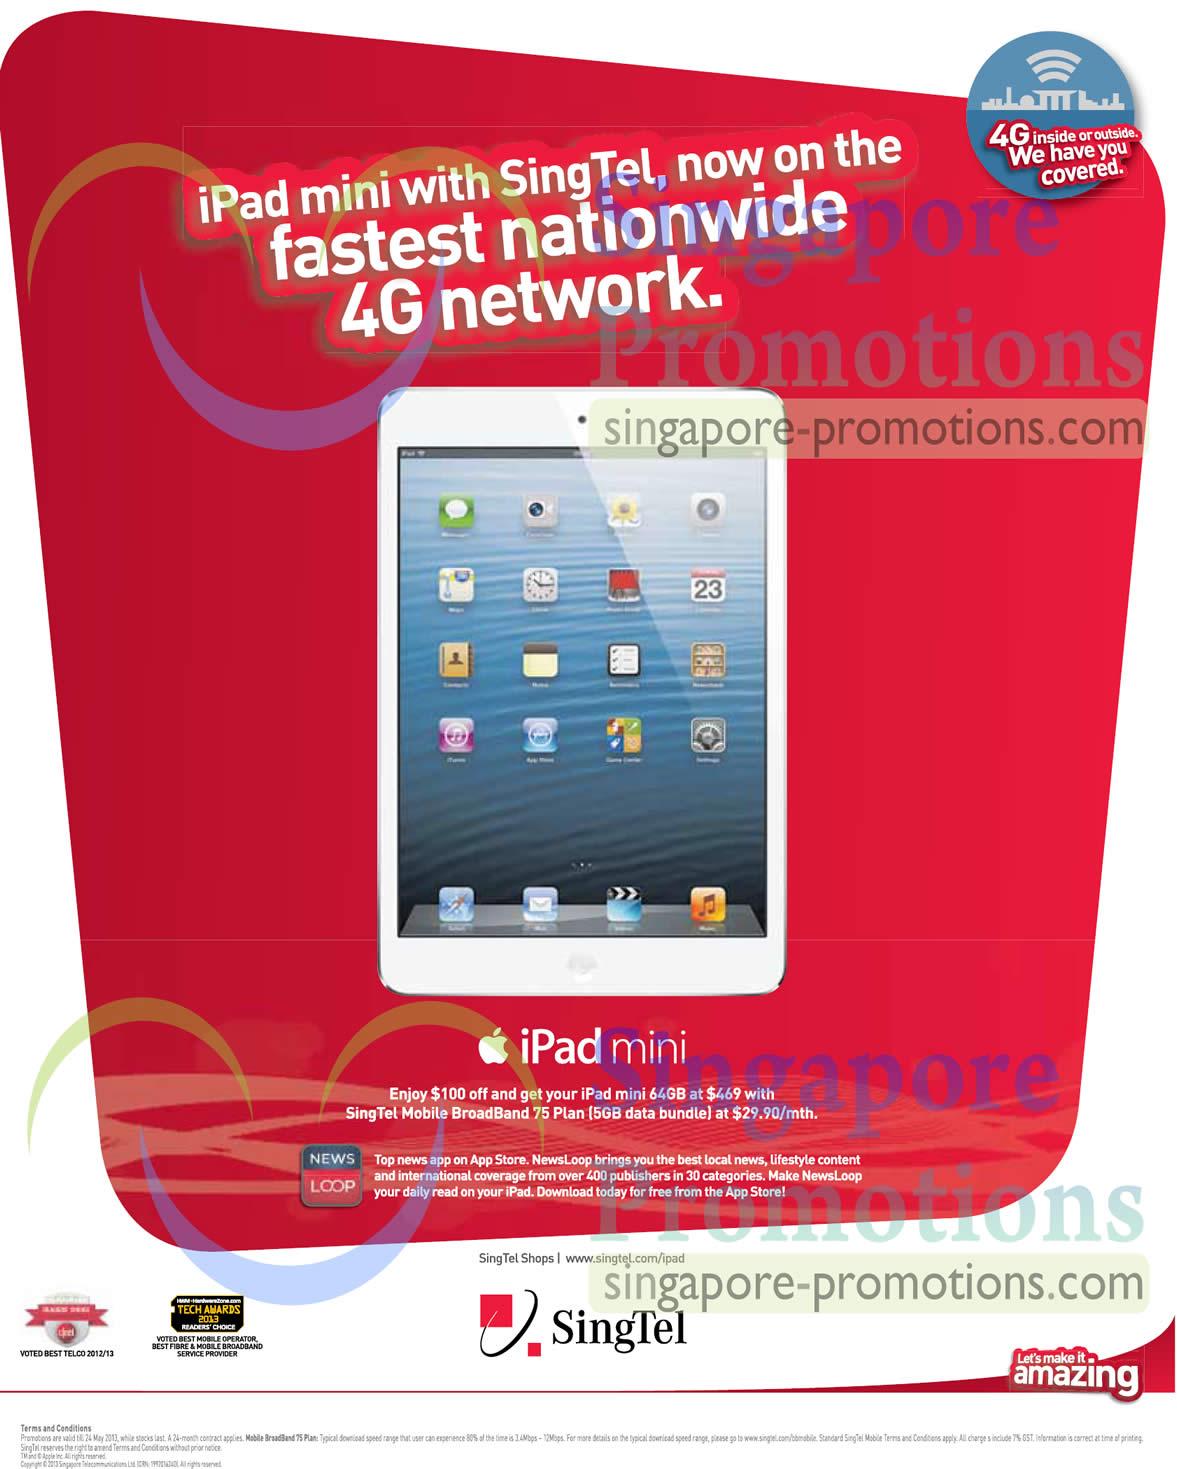 Singtel Smartphones, Tablets, Home / Mobile Broadband & Mio TV